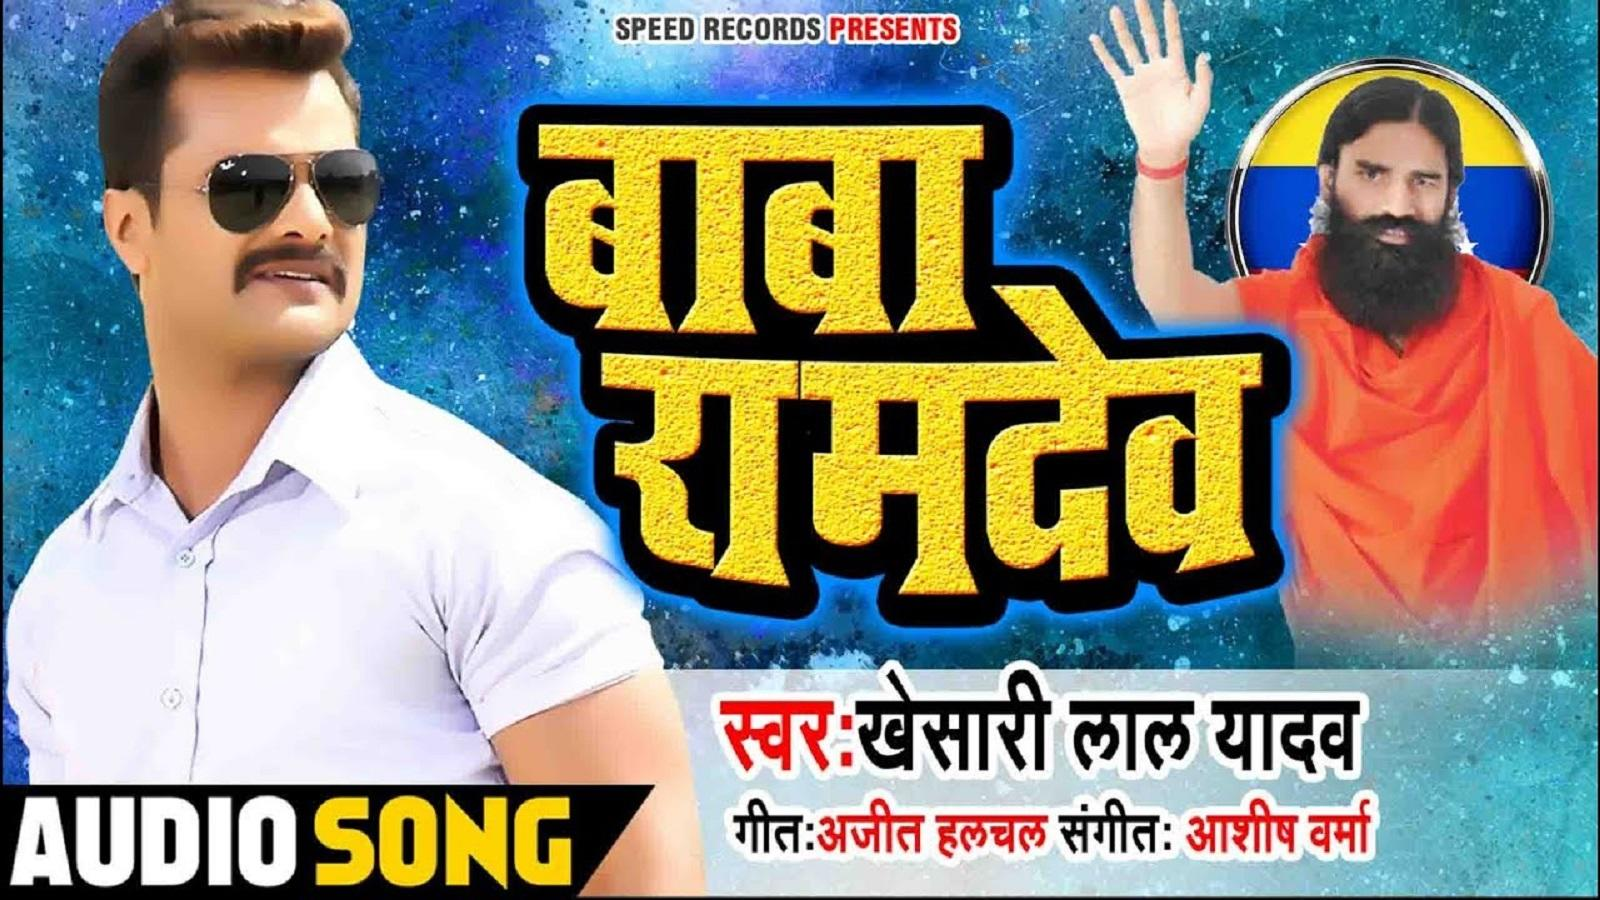 Latest Bhojpuri song 'Baba Ramdev' (Audio) sung by Khesari Lal Yadav